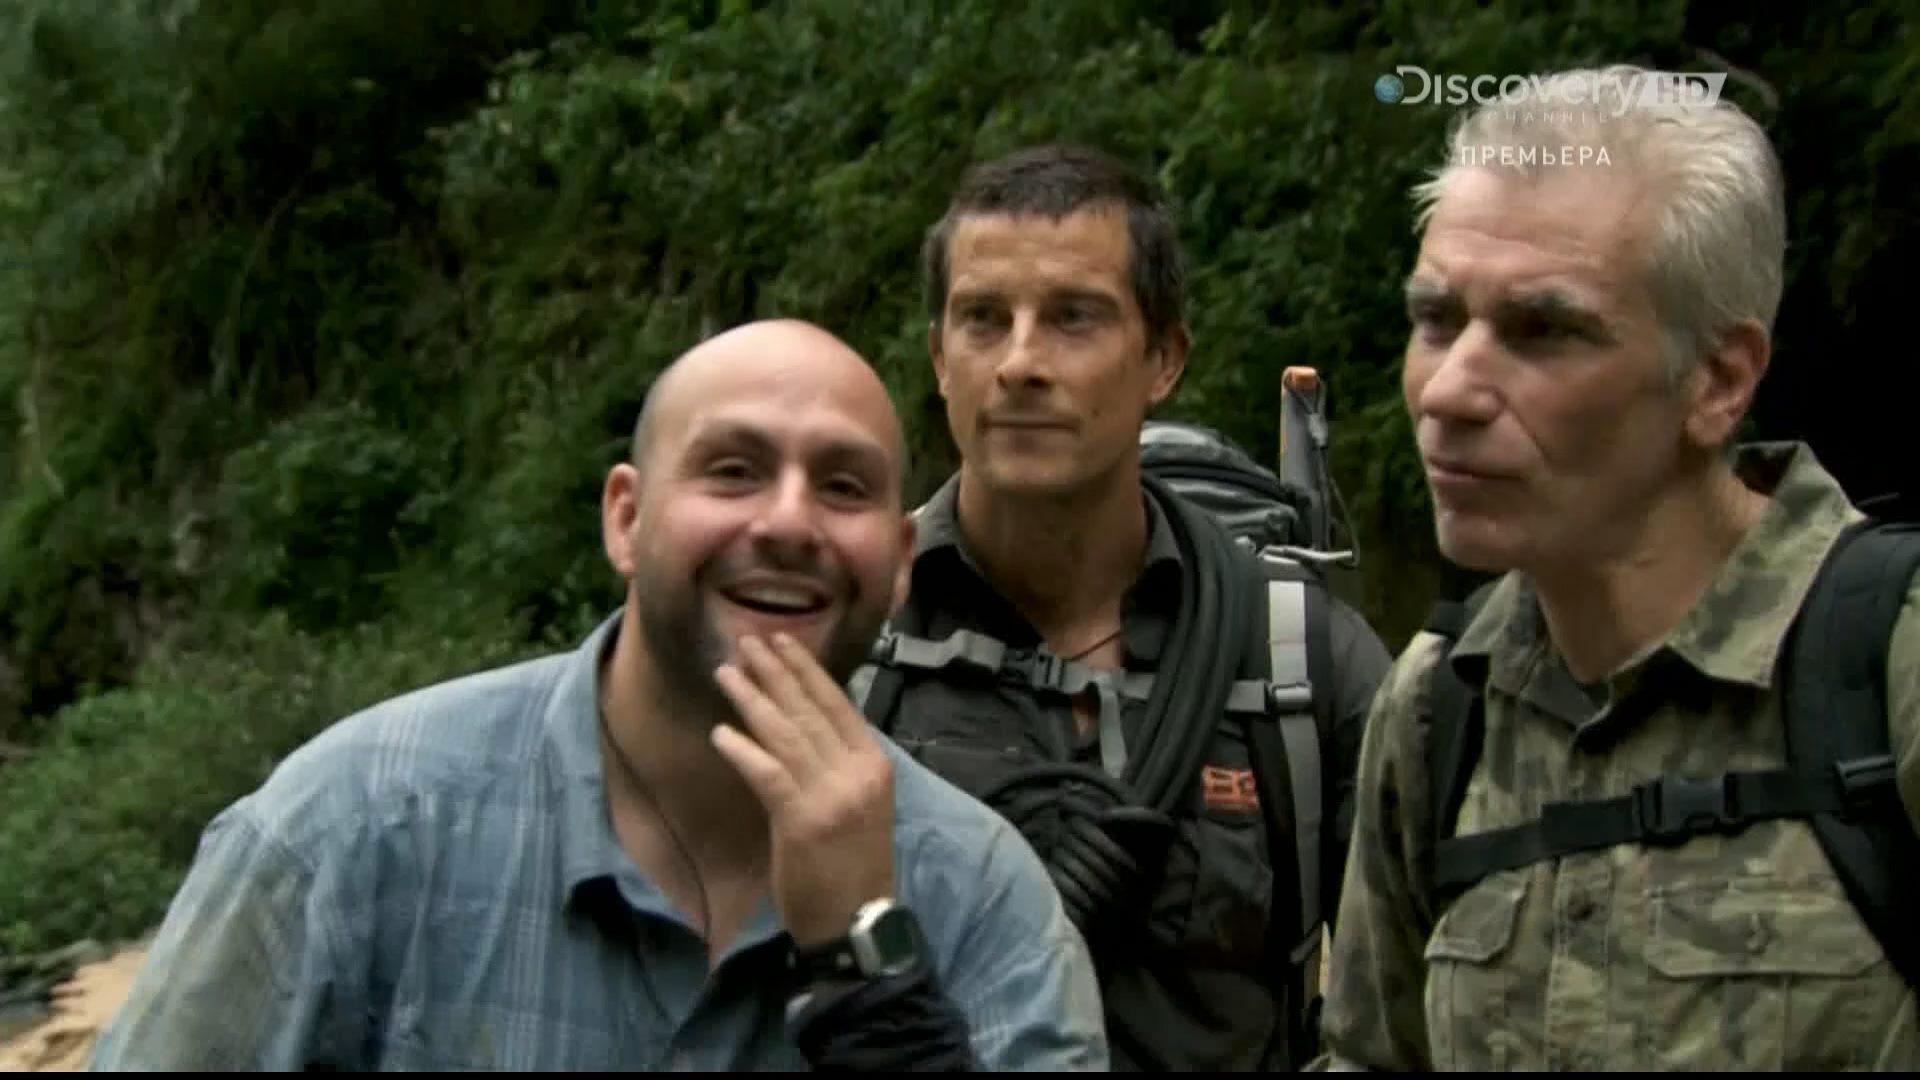 Discovery. Беар Гриллс: испытание страхом / Bear Grylls: Breaking Point (1-6 серия) (2014) HDTV 1080i